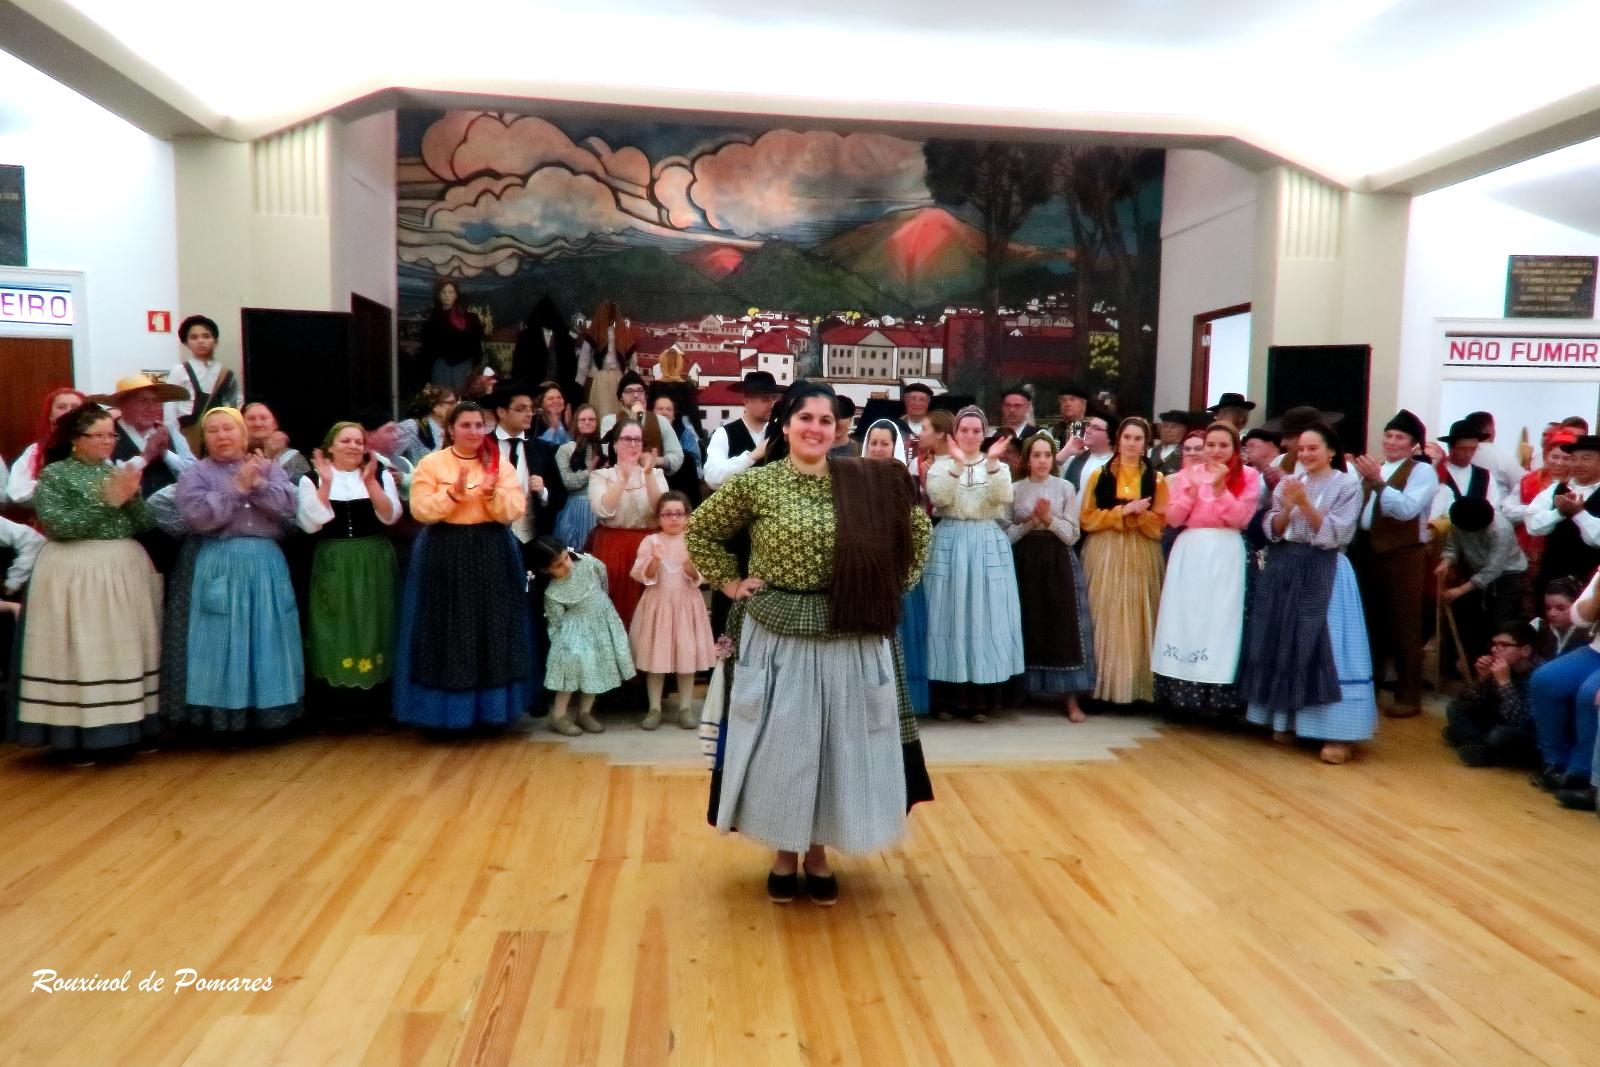 Festa Regionalista Casa da Comarca (002a)